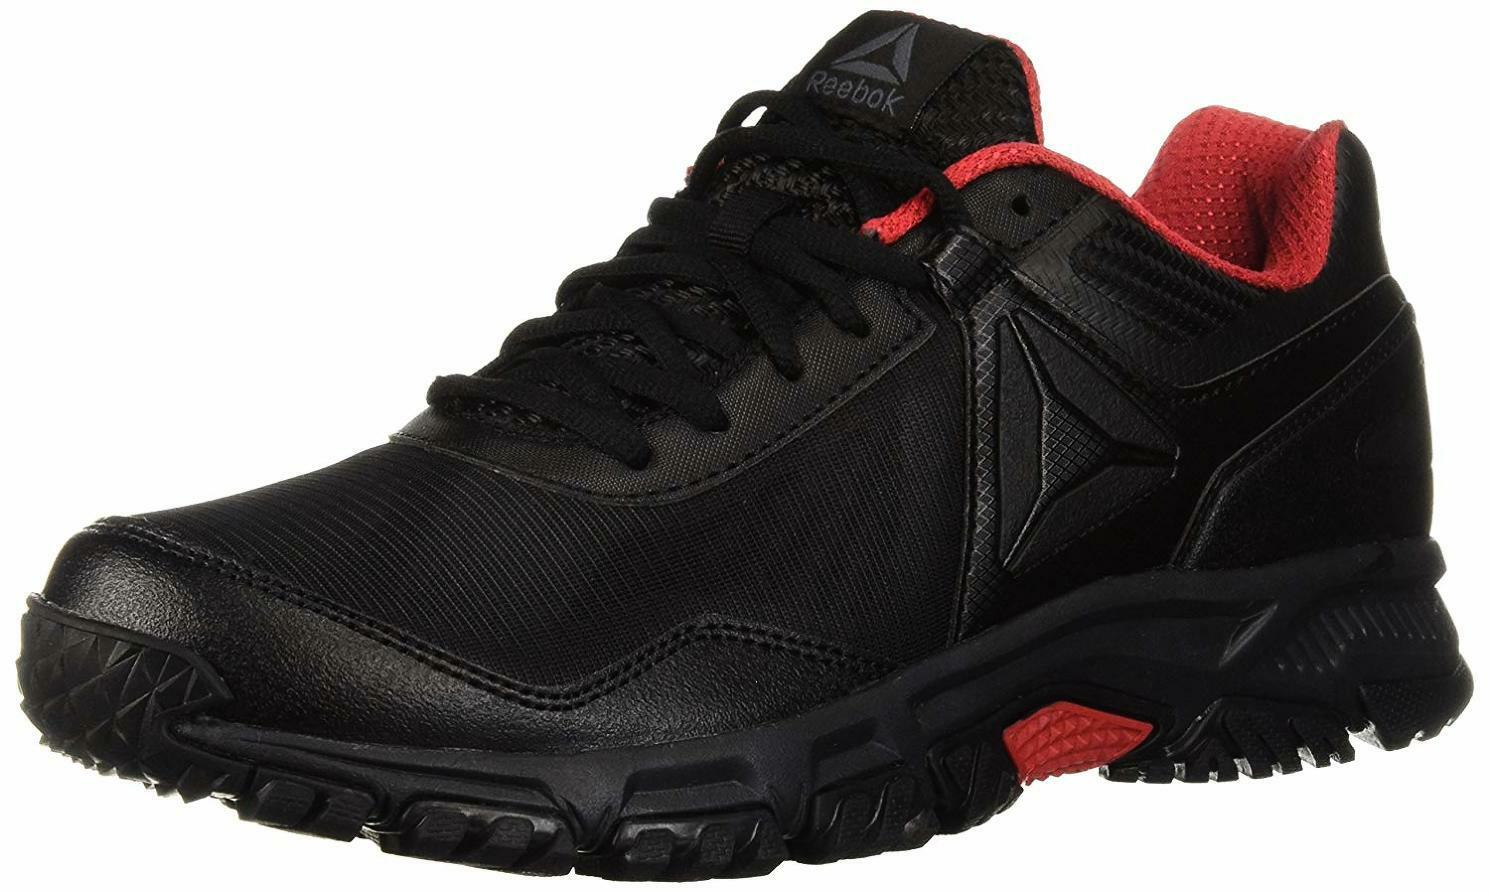 Homme Reebok ridgerider Trail 3.0 en marchant chaussures-Choisir Taille couleur